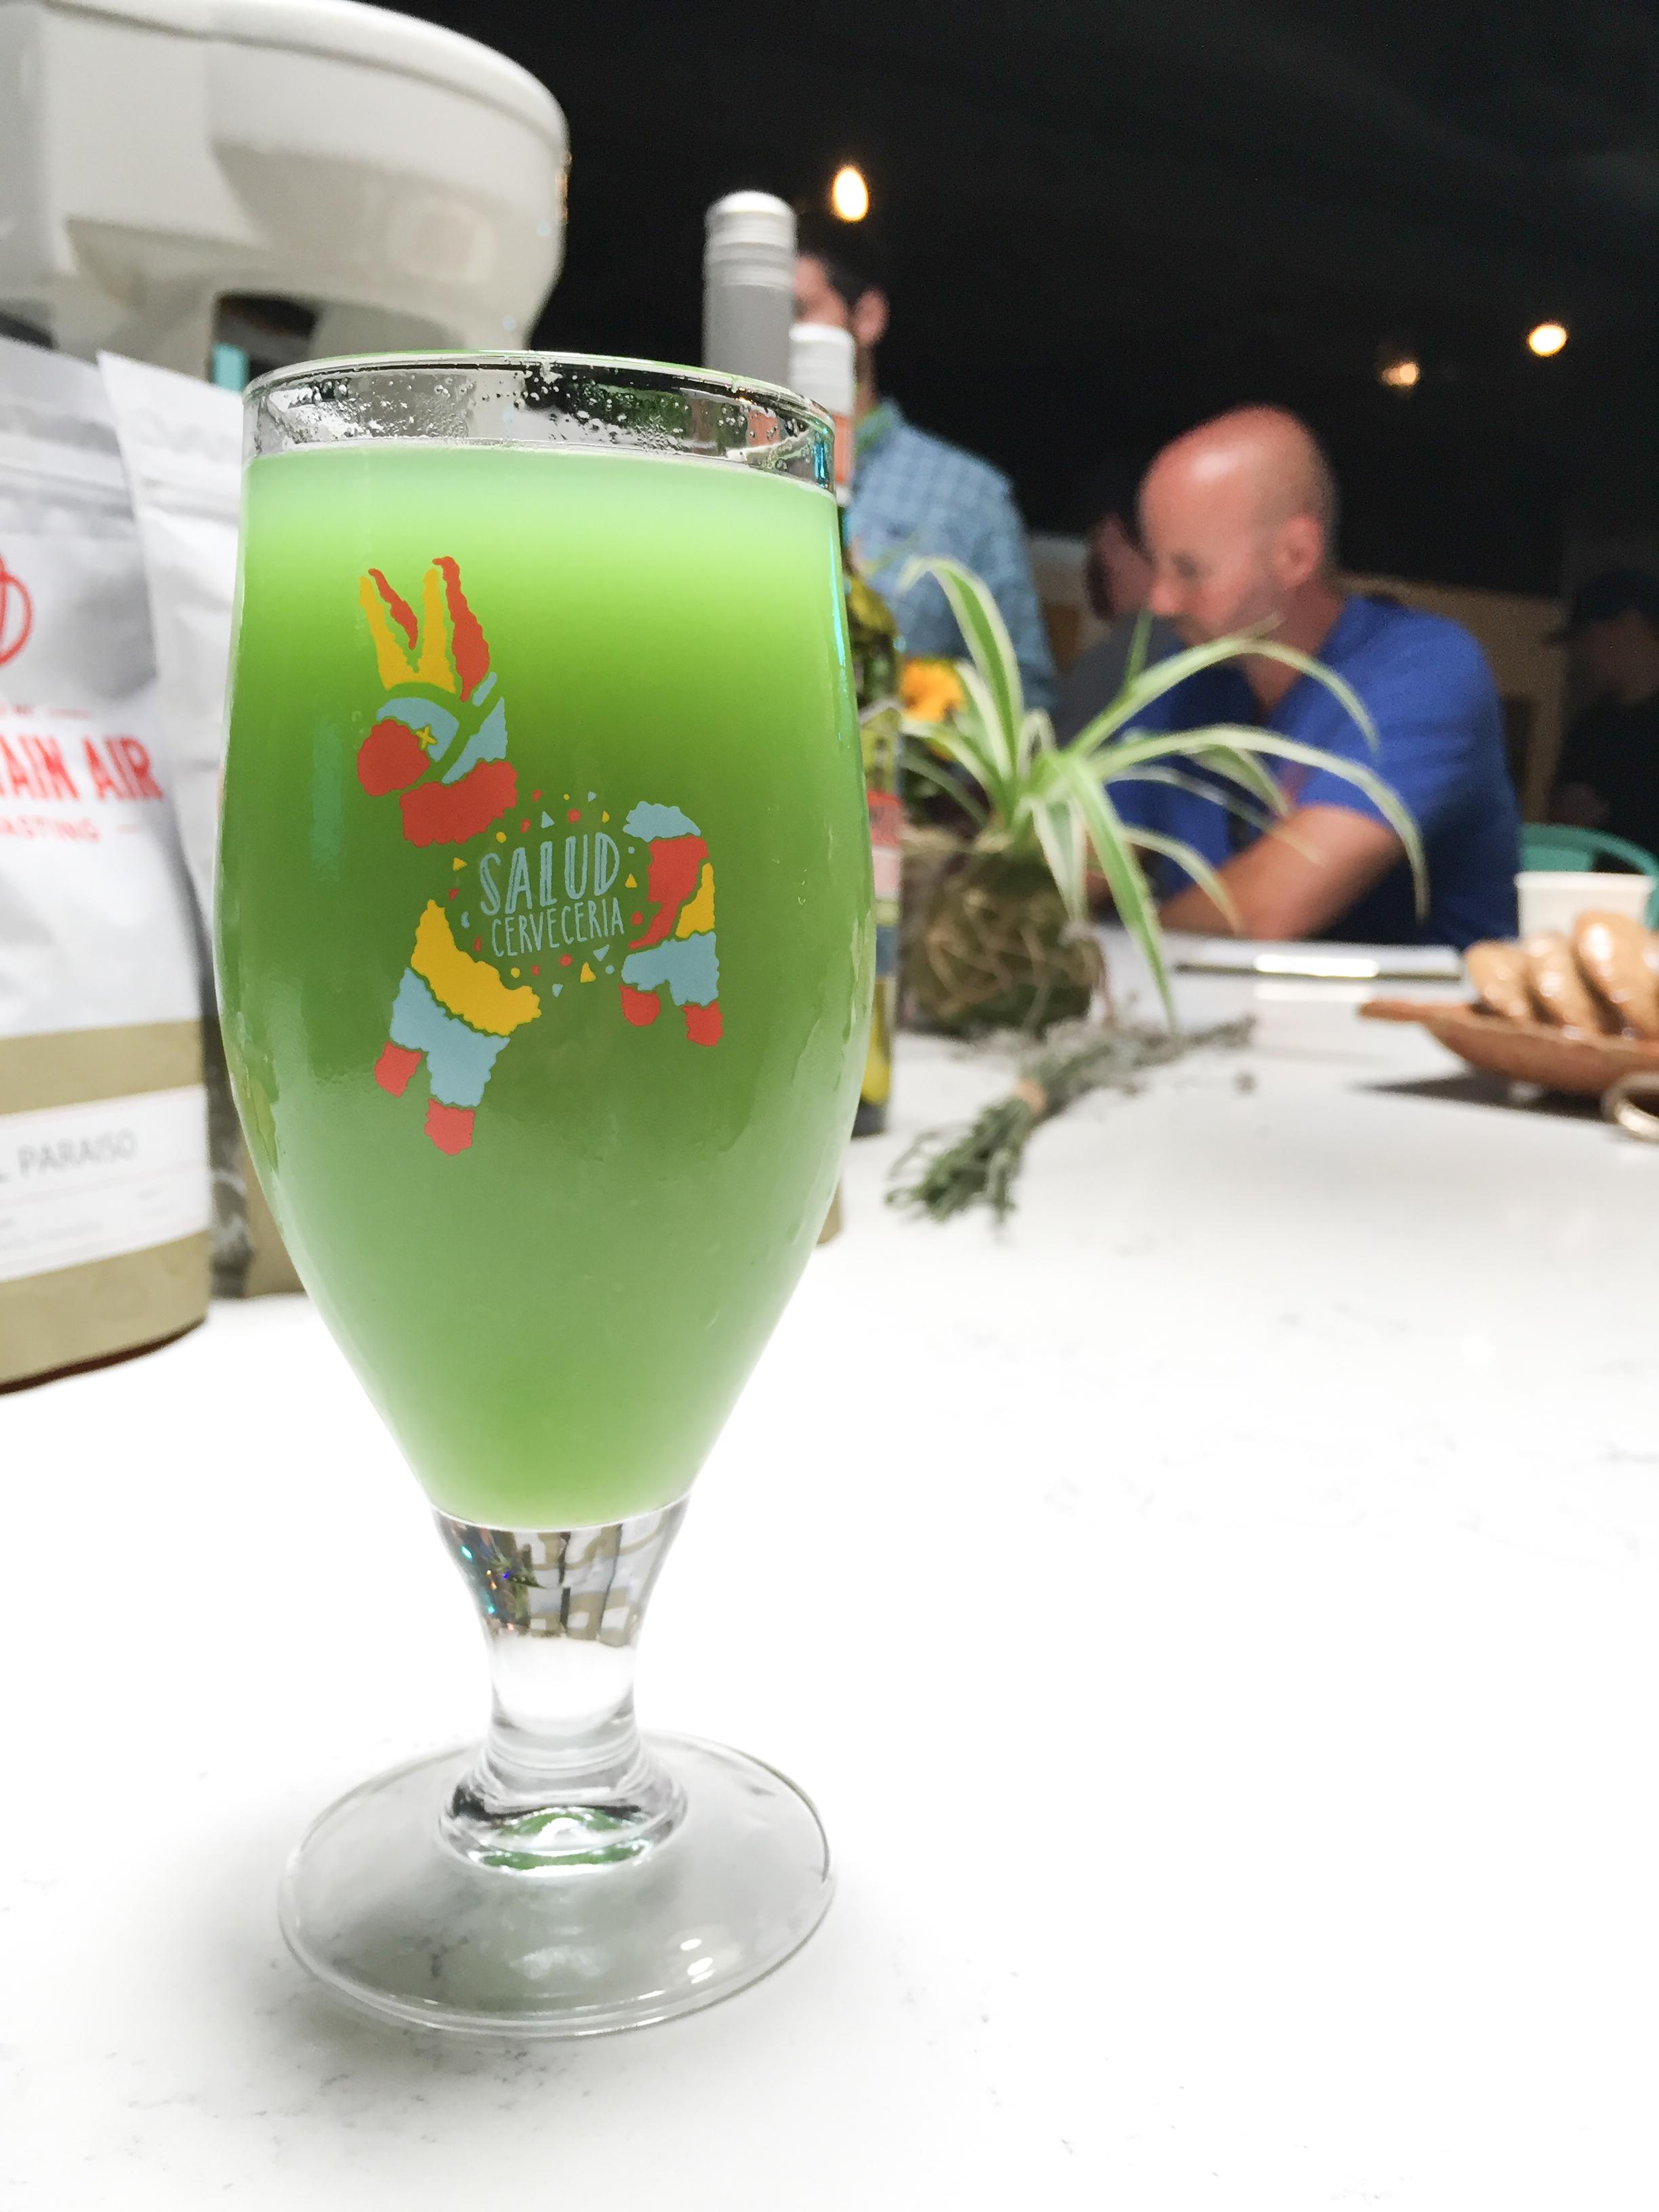 salud-cerveceria-noda-charlotte-nc-green-drank-drink-peruvian-soda